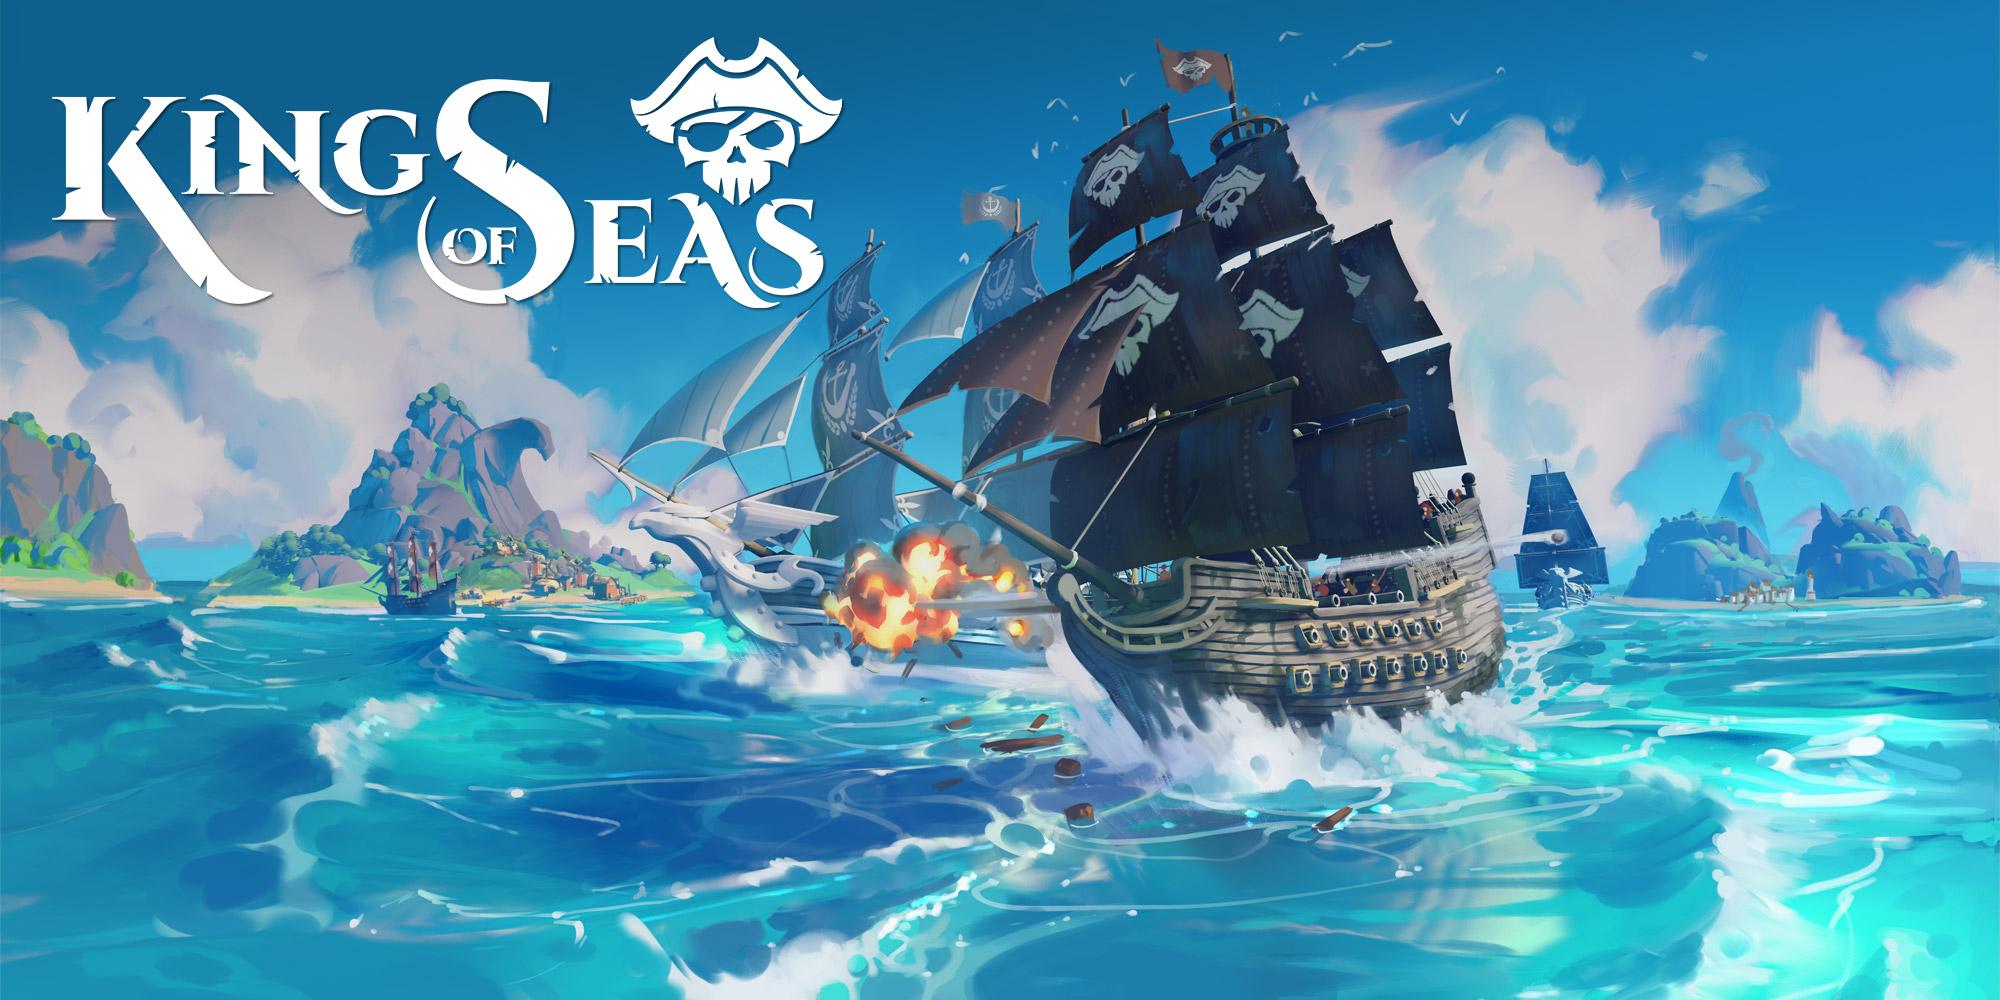 King of Seas: Eine Indiehommage an Sid Meier's Pirates